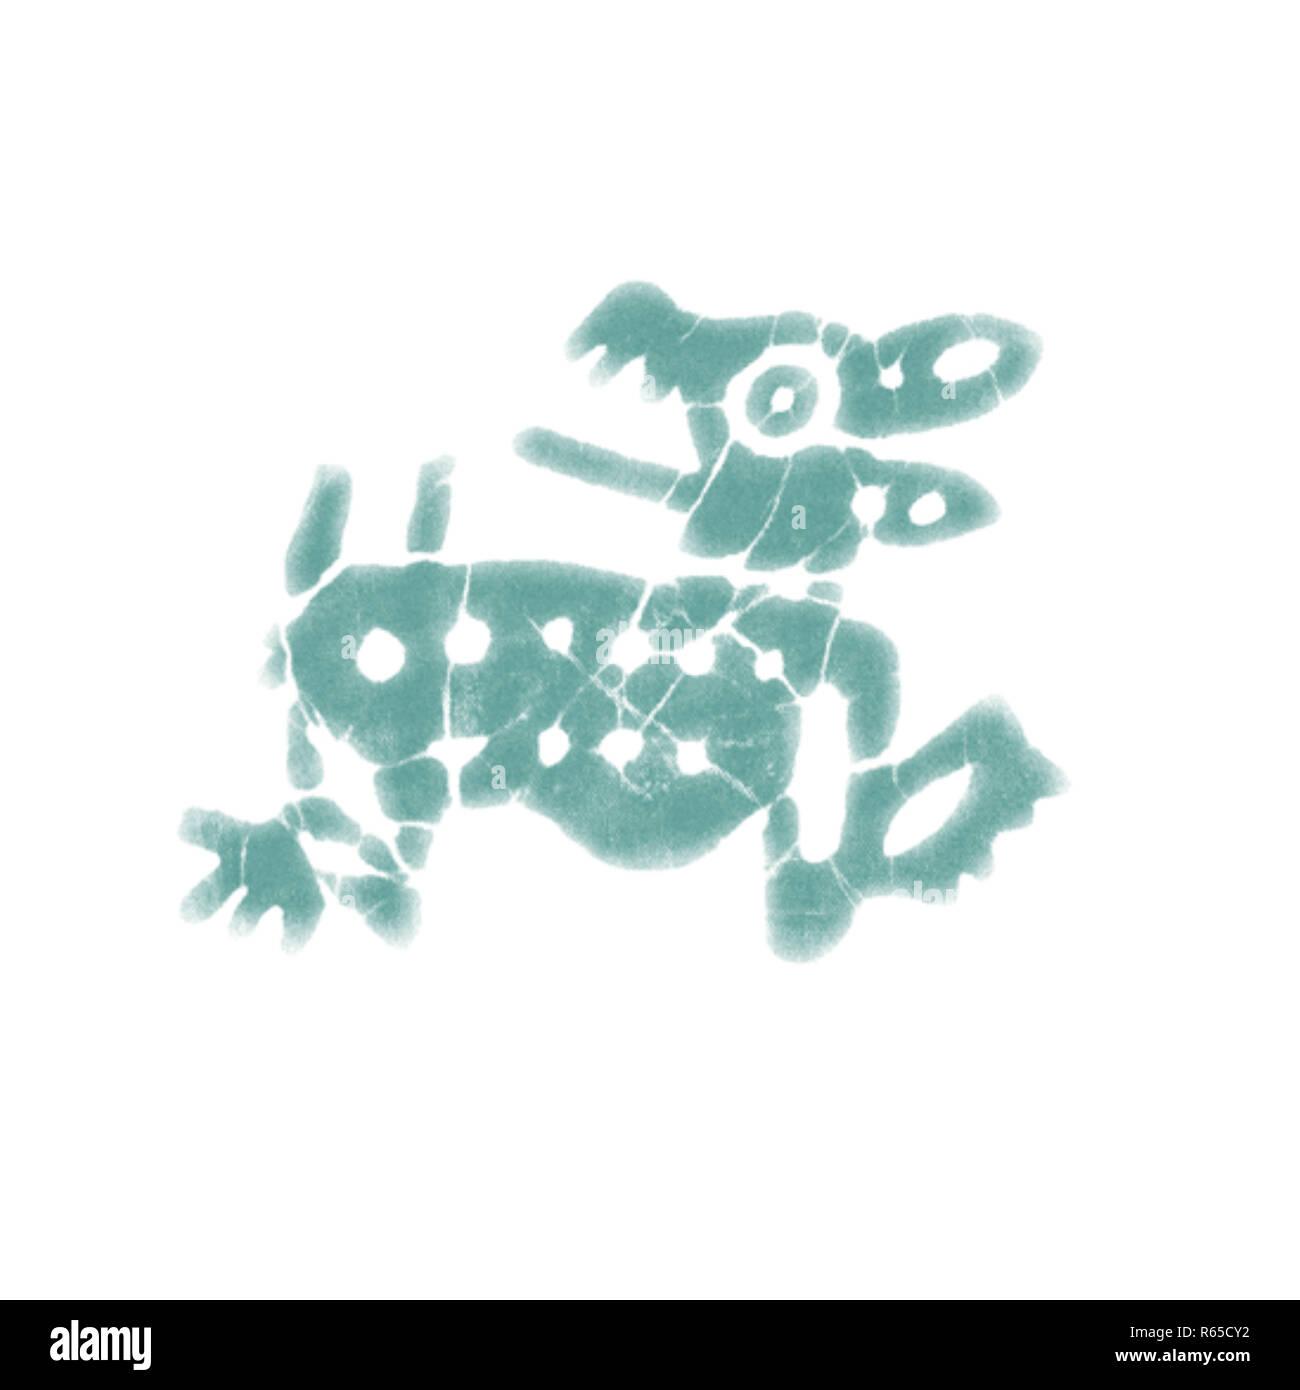 Primitive Tribal Animal Drawings - 5d.jpg - R65CY2 1R65CY2 - Stock Image